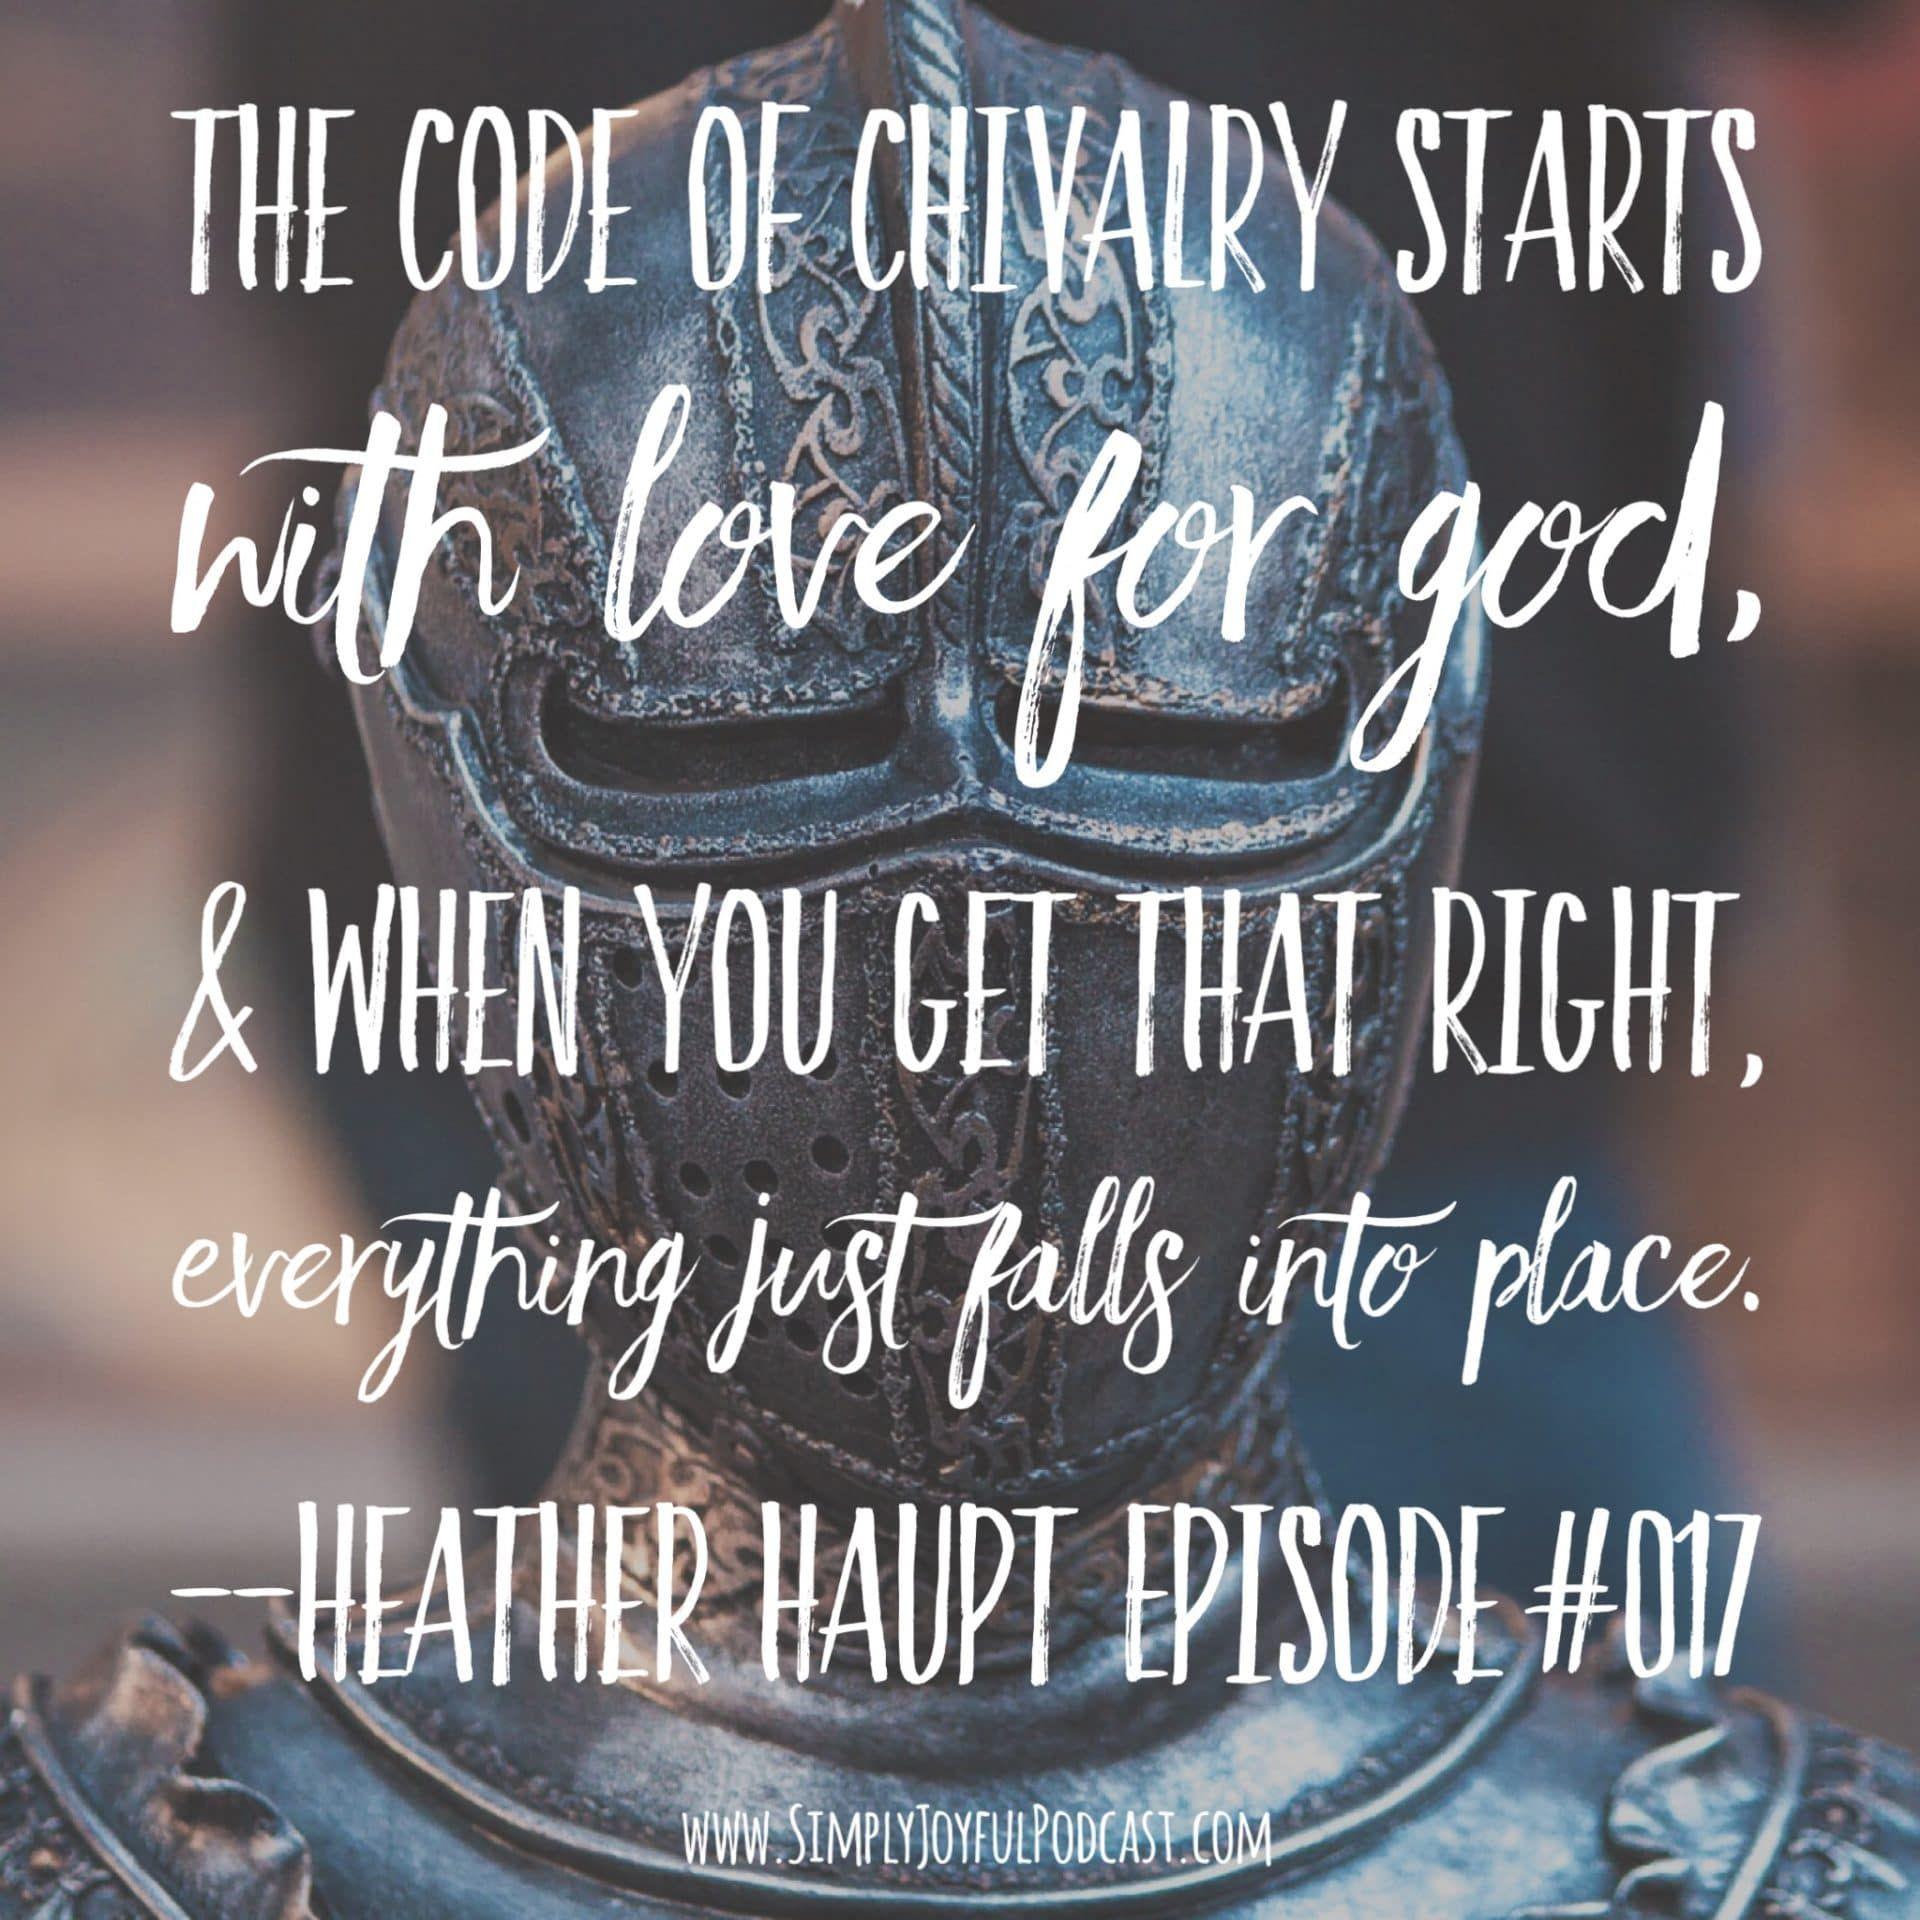 SJP #017: Heather Haupt: A Return to Chivalry: Making Character Training Fun #chivalryquotes